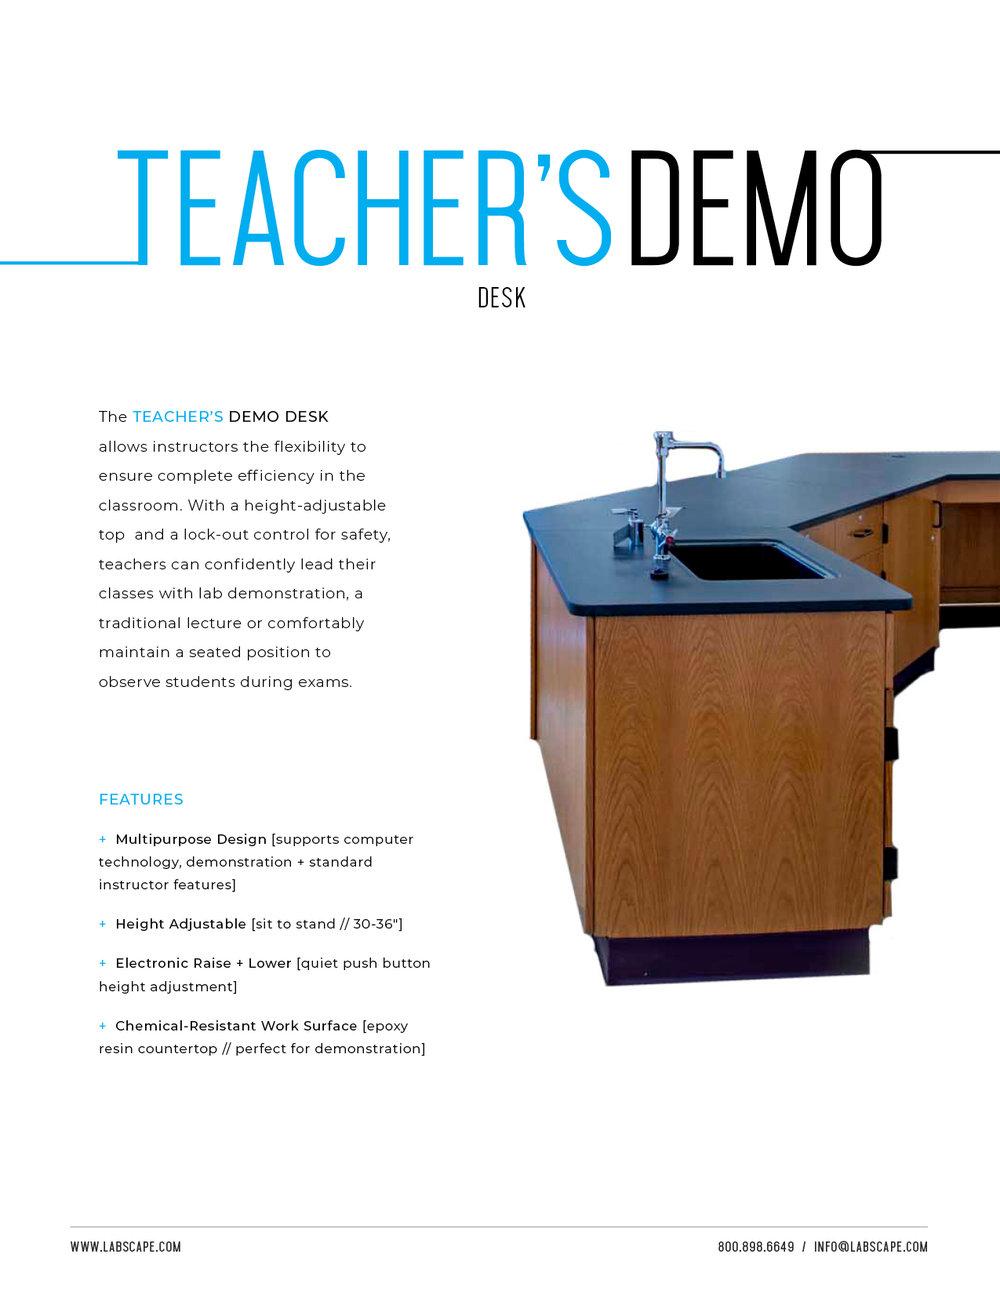 LS - TEACHER DEMO DESK.jpg